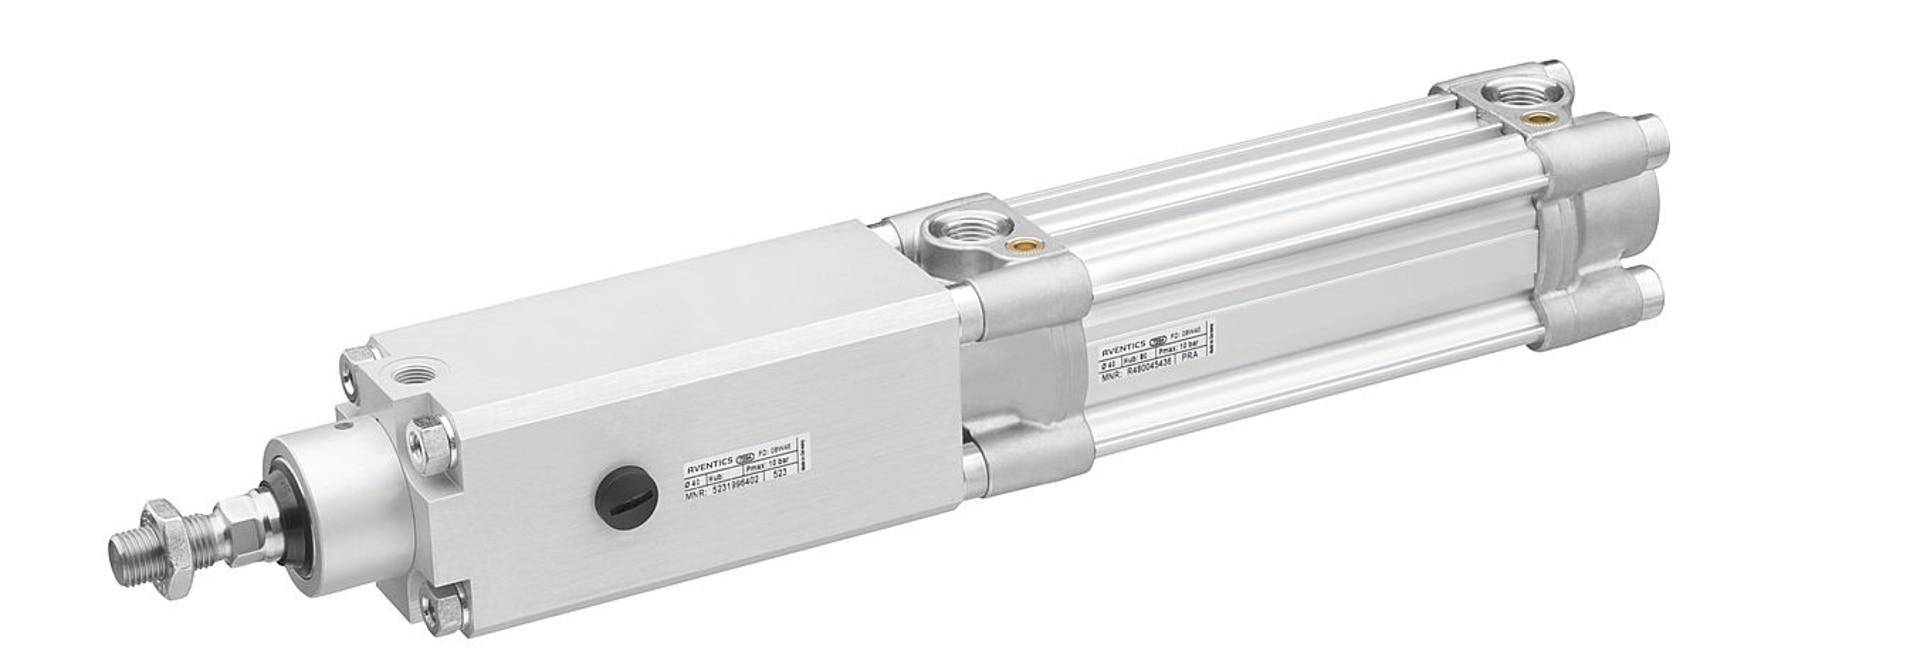 Aventics to showcase its certified LU6 locking unit at the Motek 2015